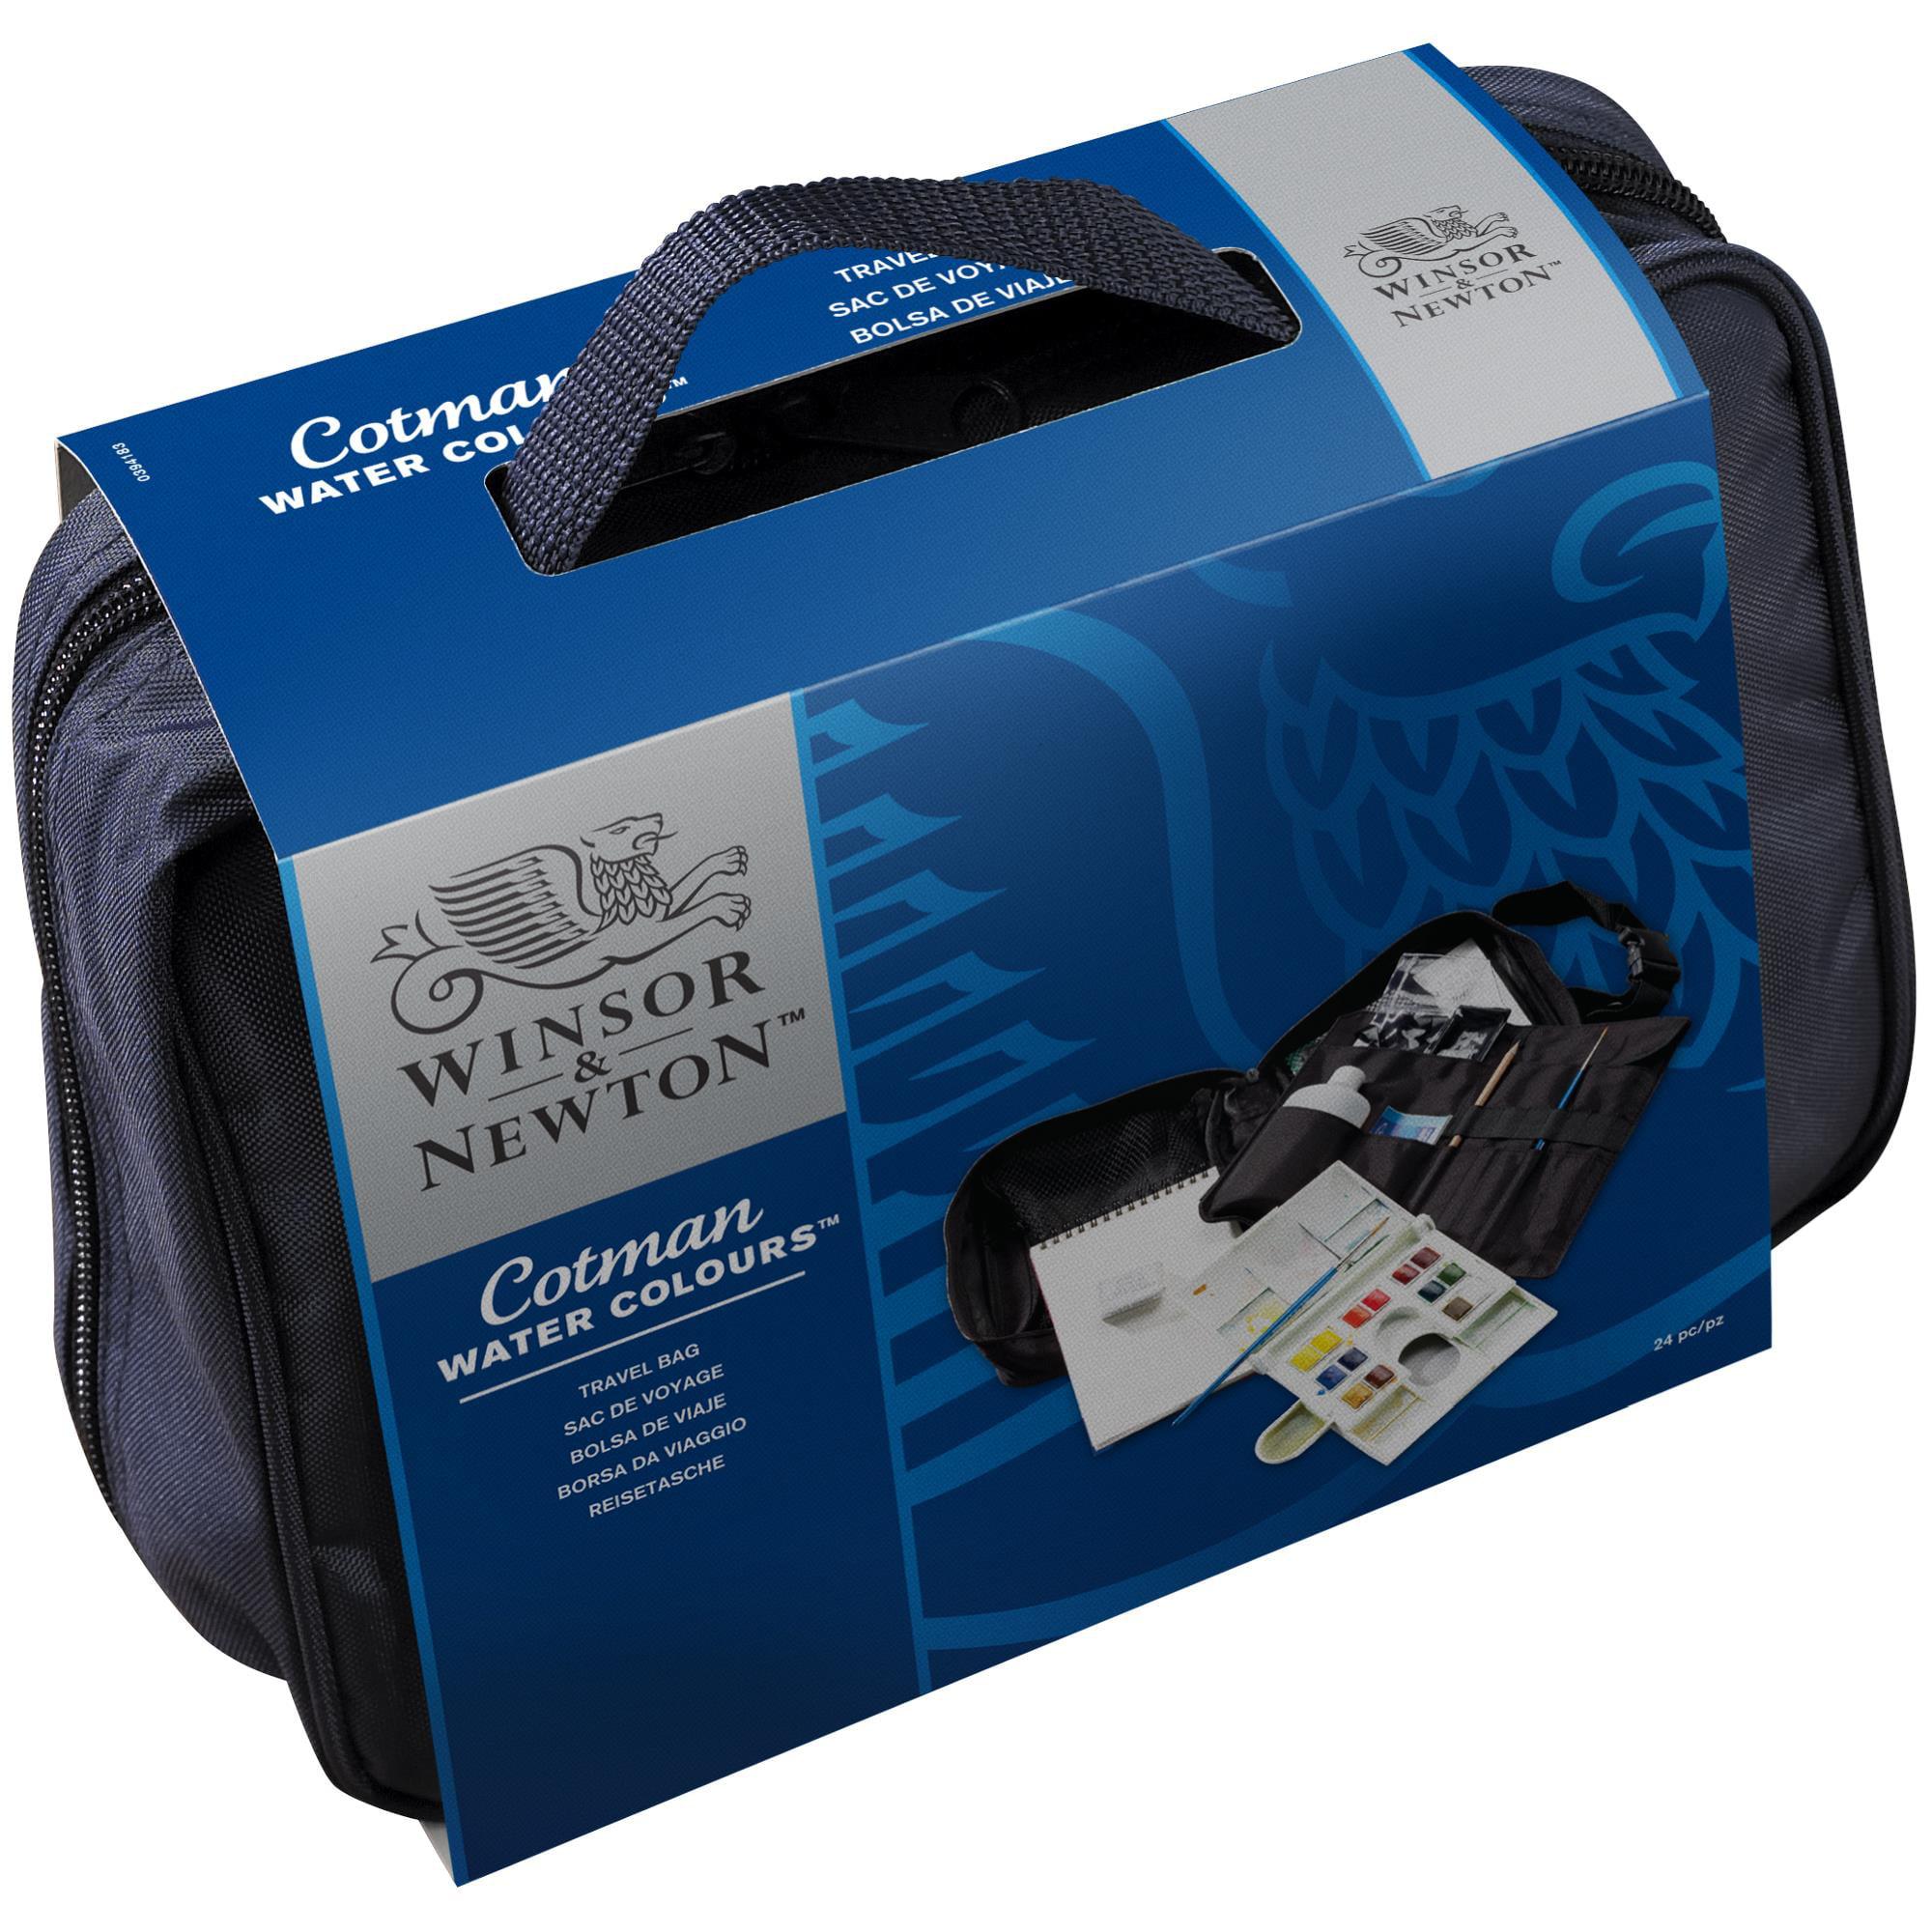 Winsor & Newton Cotman Watercolor - Travel Bag Set